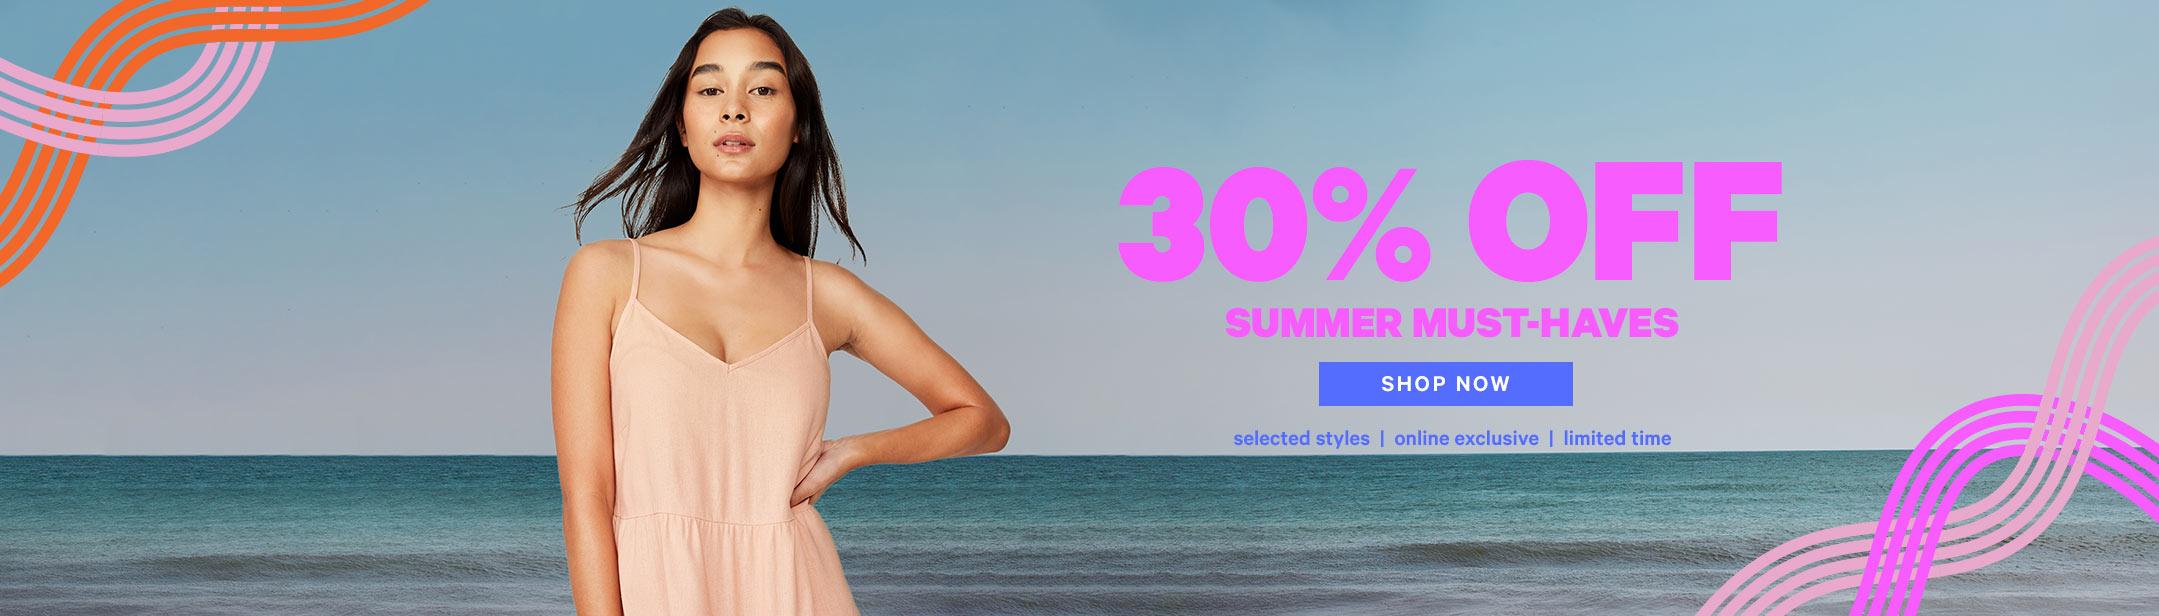 30% Off Summer Styles